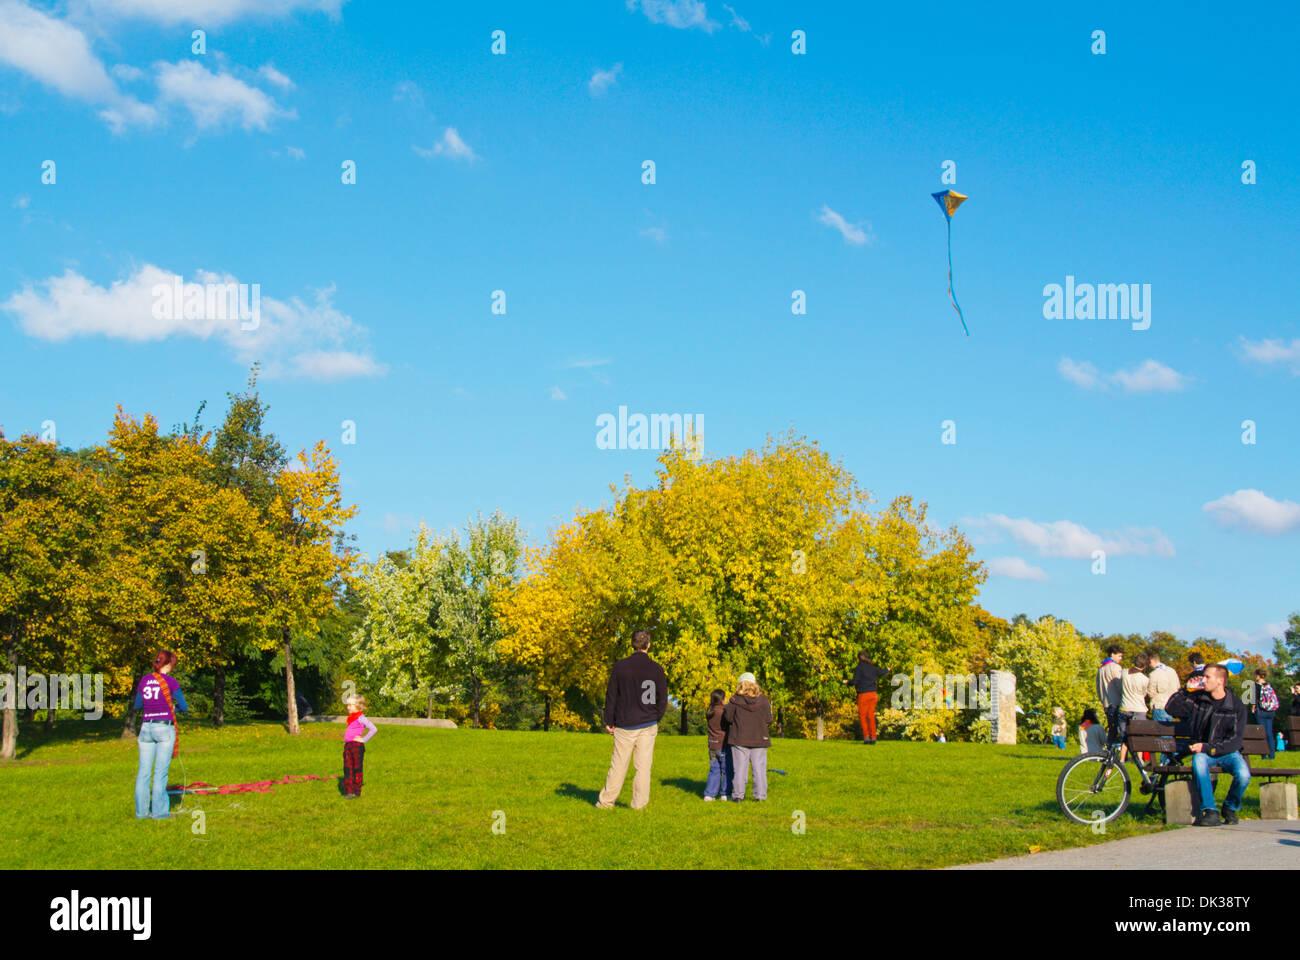 People flying kites Parukarka park Zizkov district Prague Czech Republic Europe - Stock Image